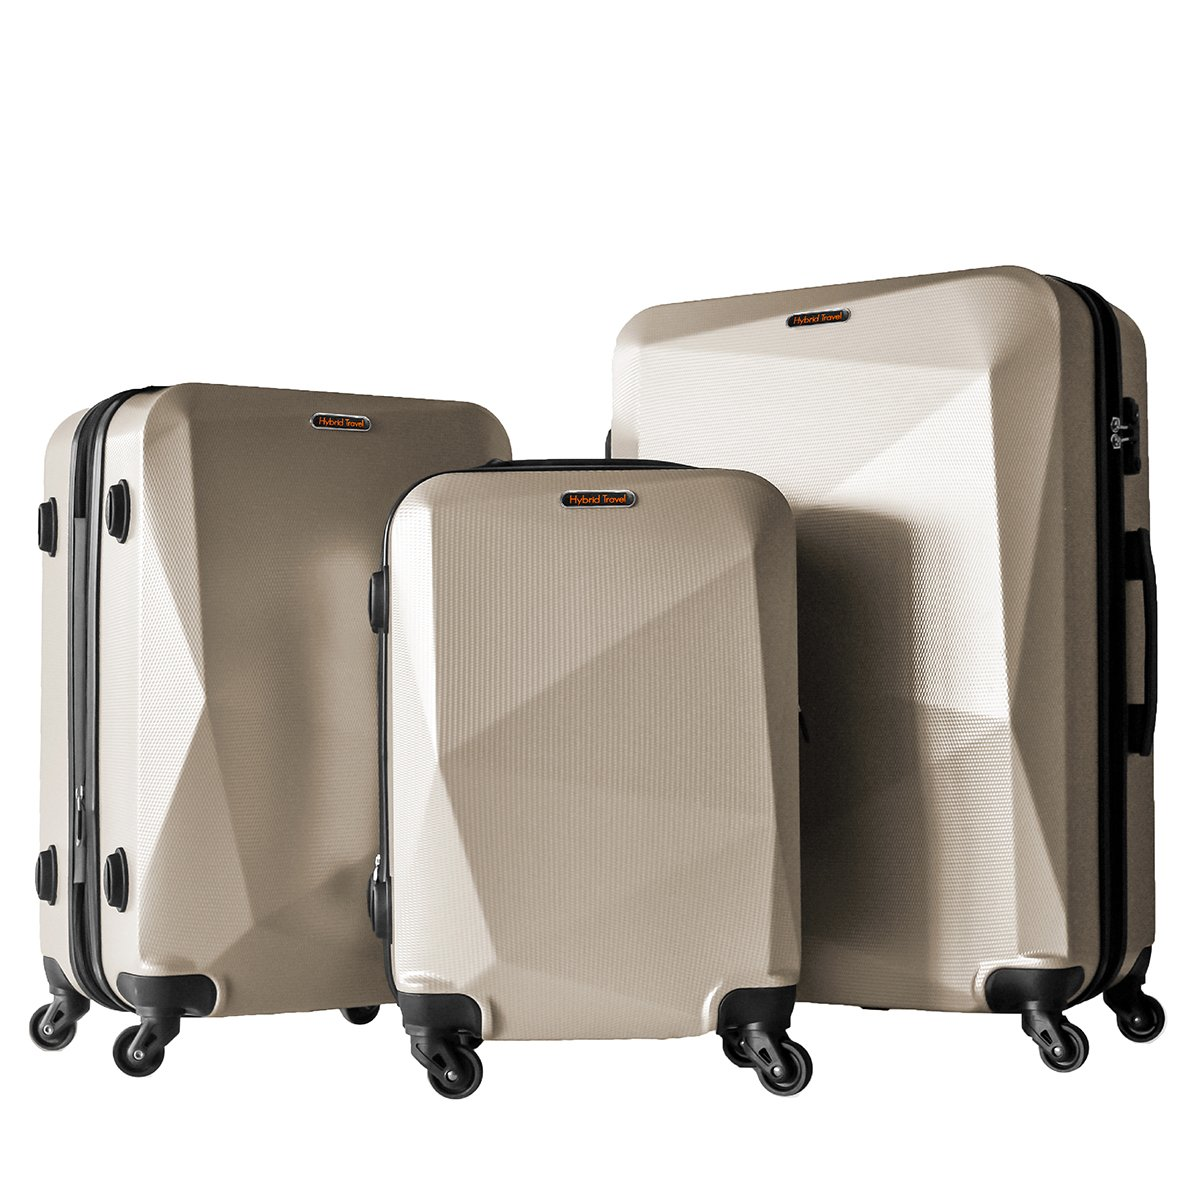 3 Piece Luggage Set Durable Lightweight Hard Case Spinner Suitecase LUG3 HD1629 GOLD